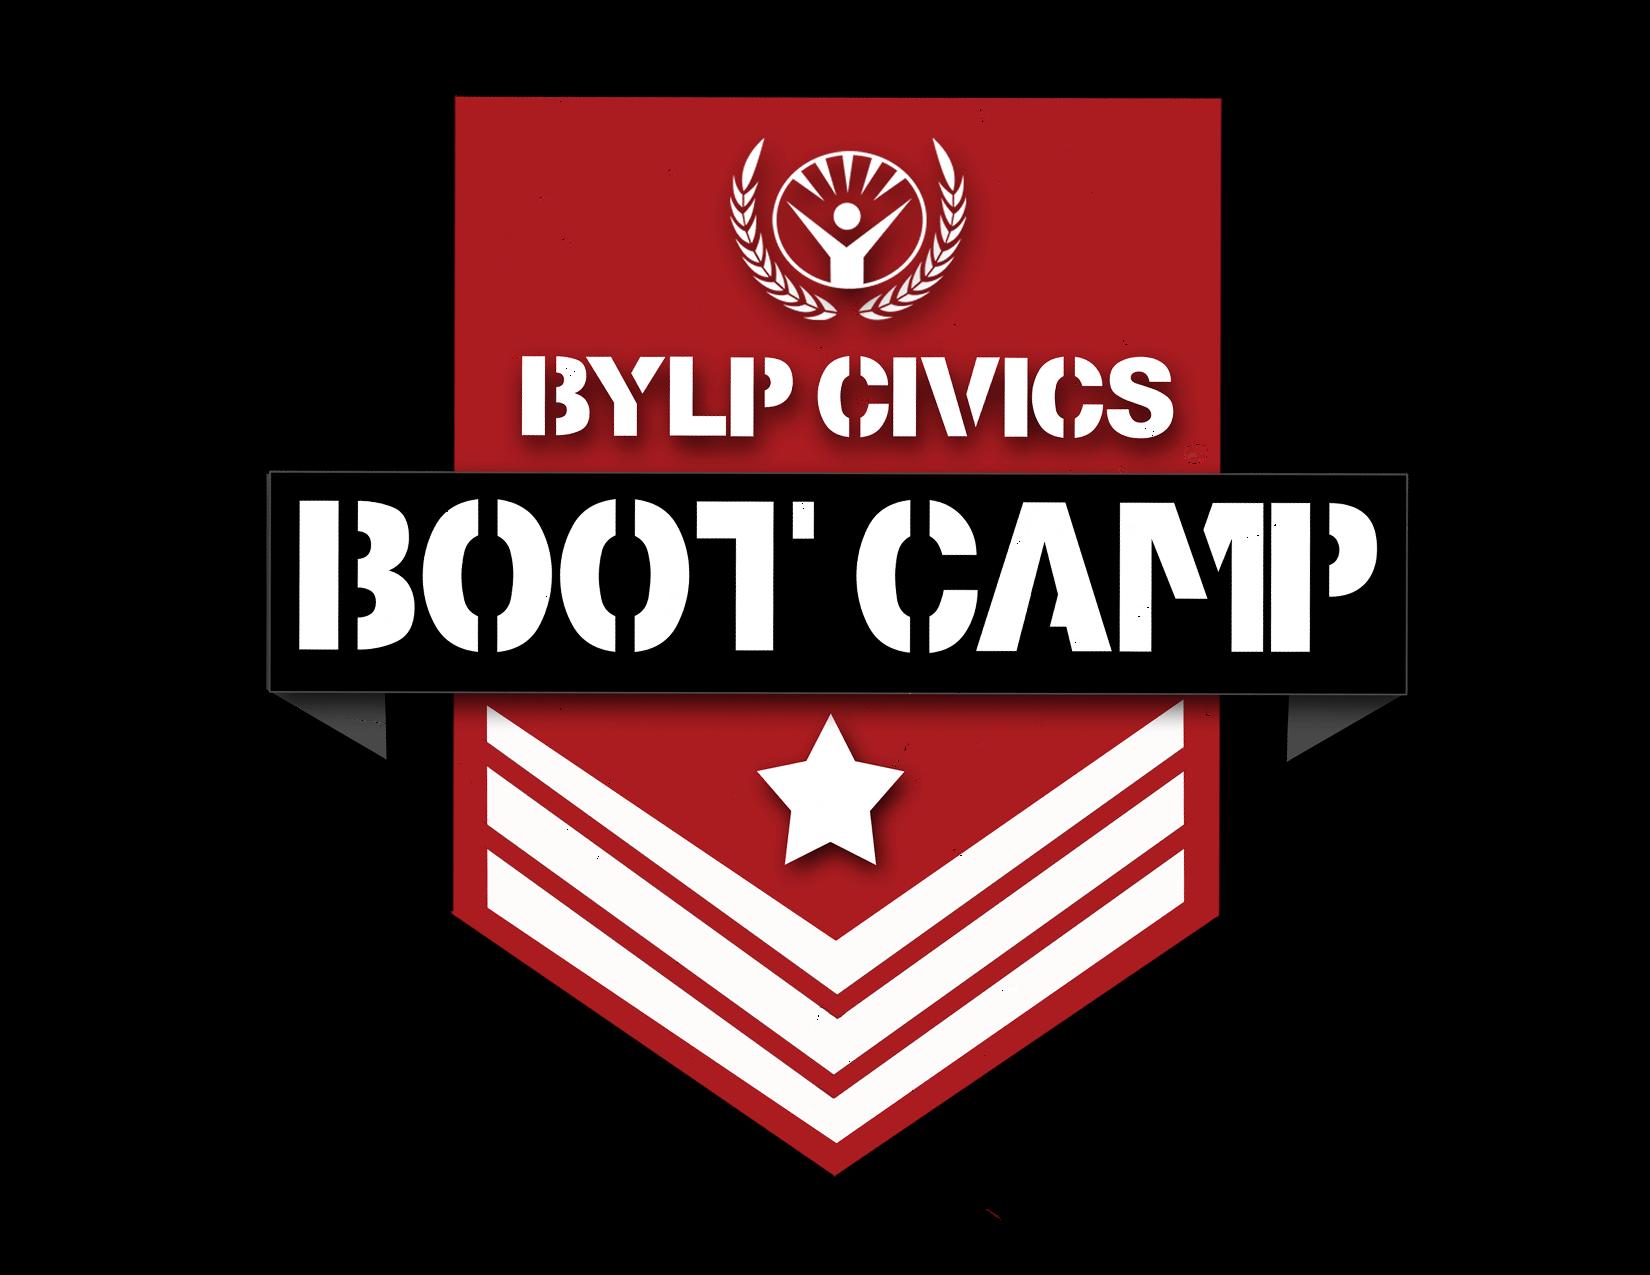 BYLP Civics Boot Camp Logo